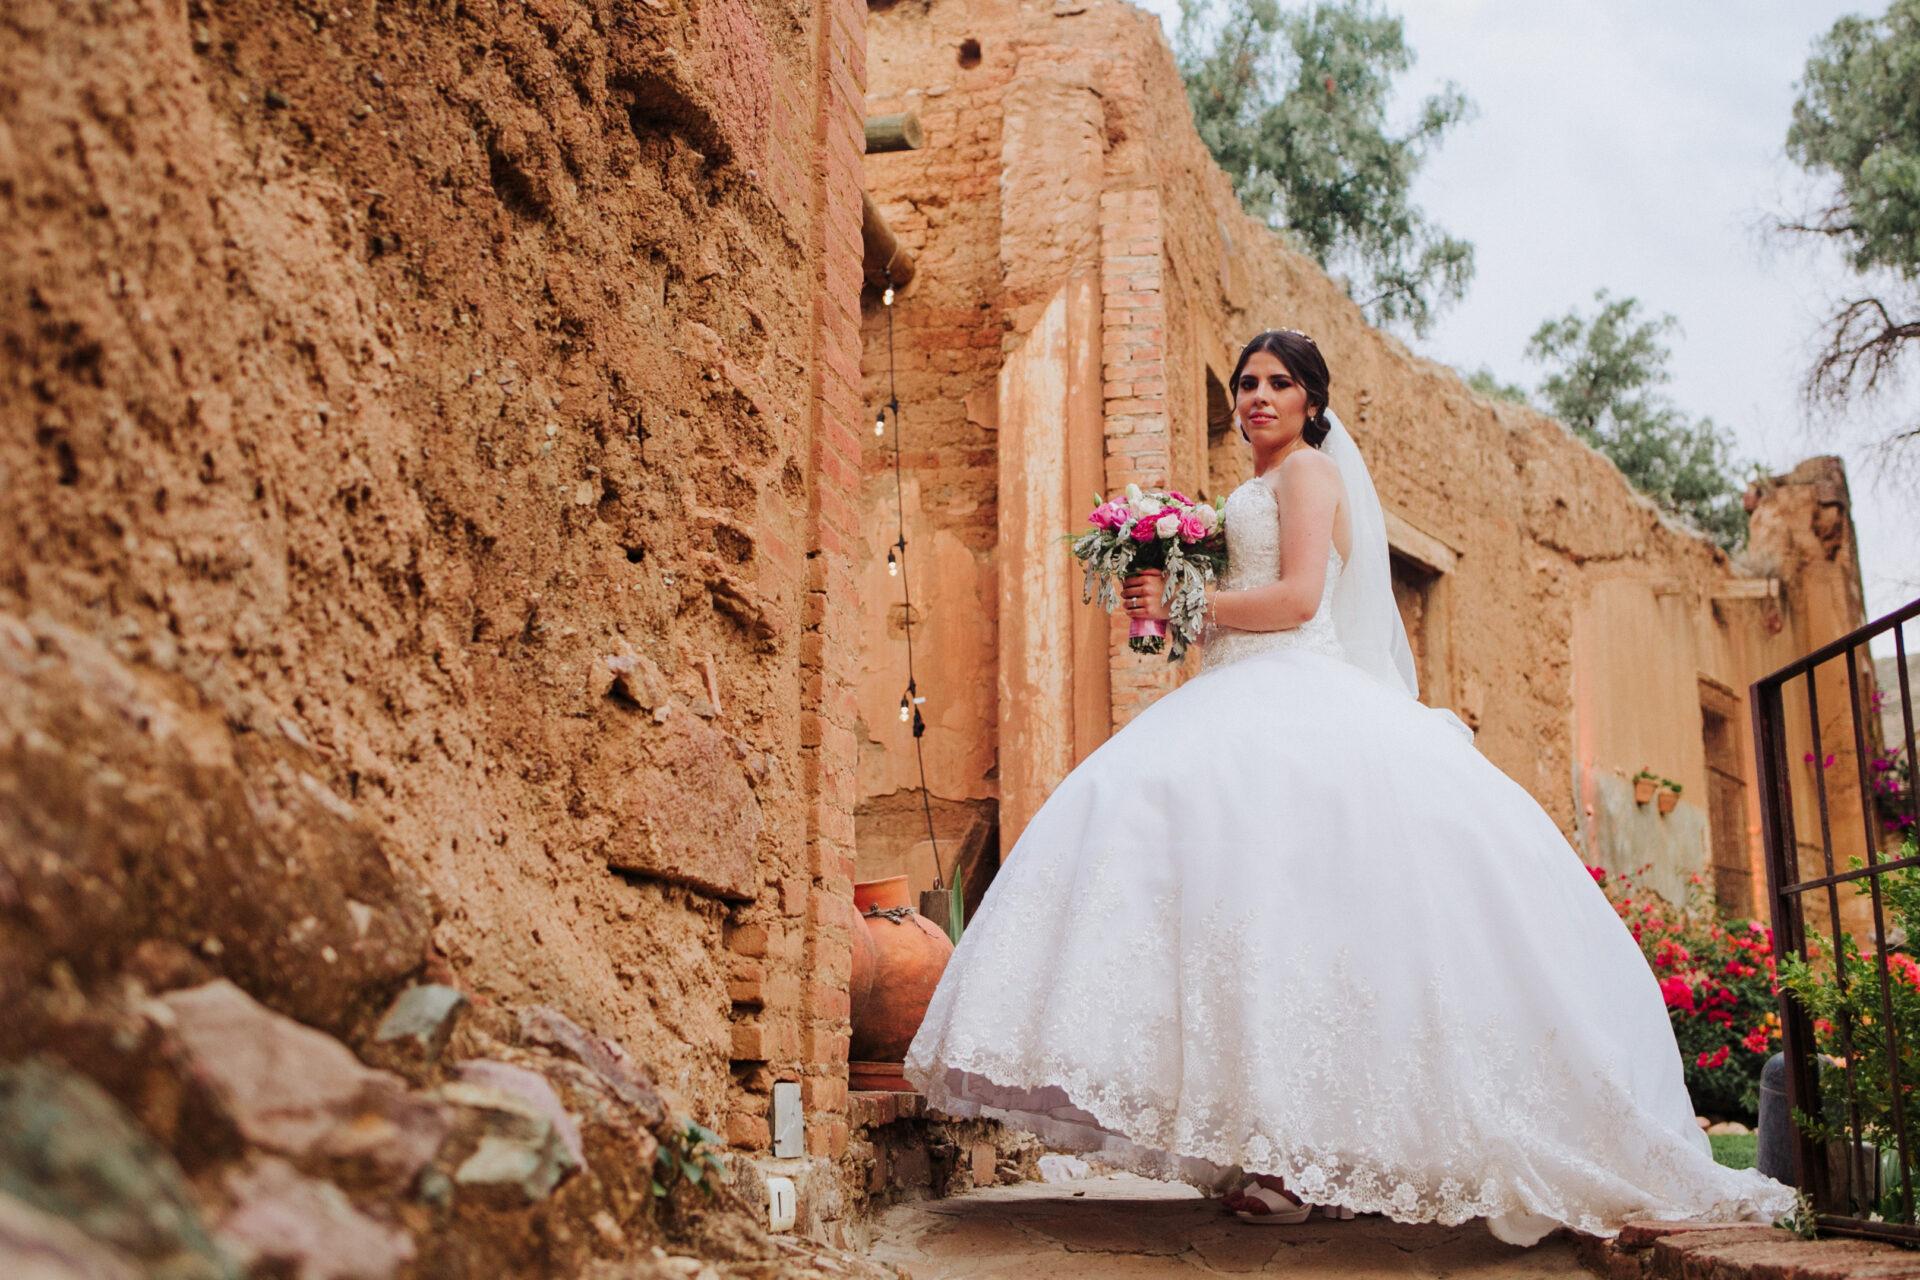 javier_noriega_fotografo_bodas_exhacienda_las_mercedes_zacatecas_wedding_photographer19a